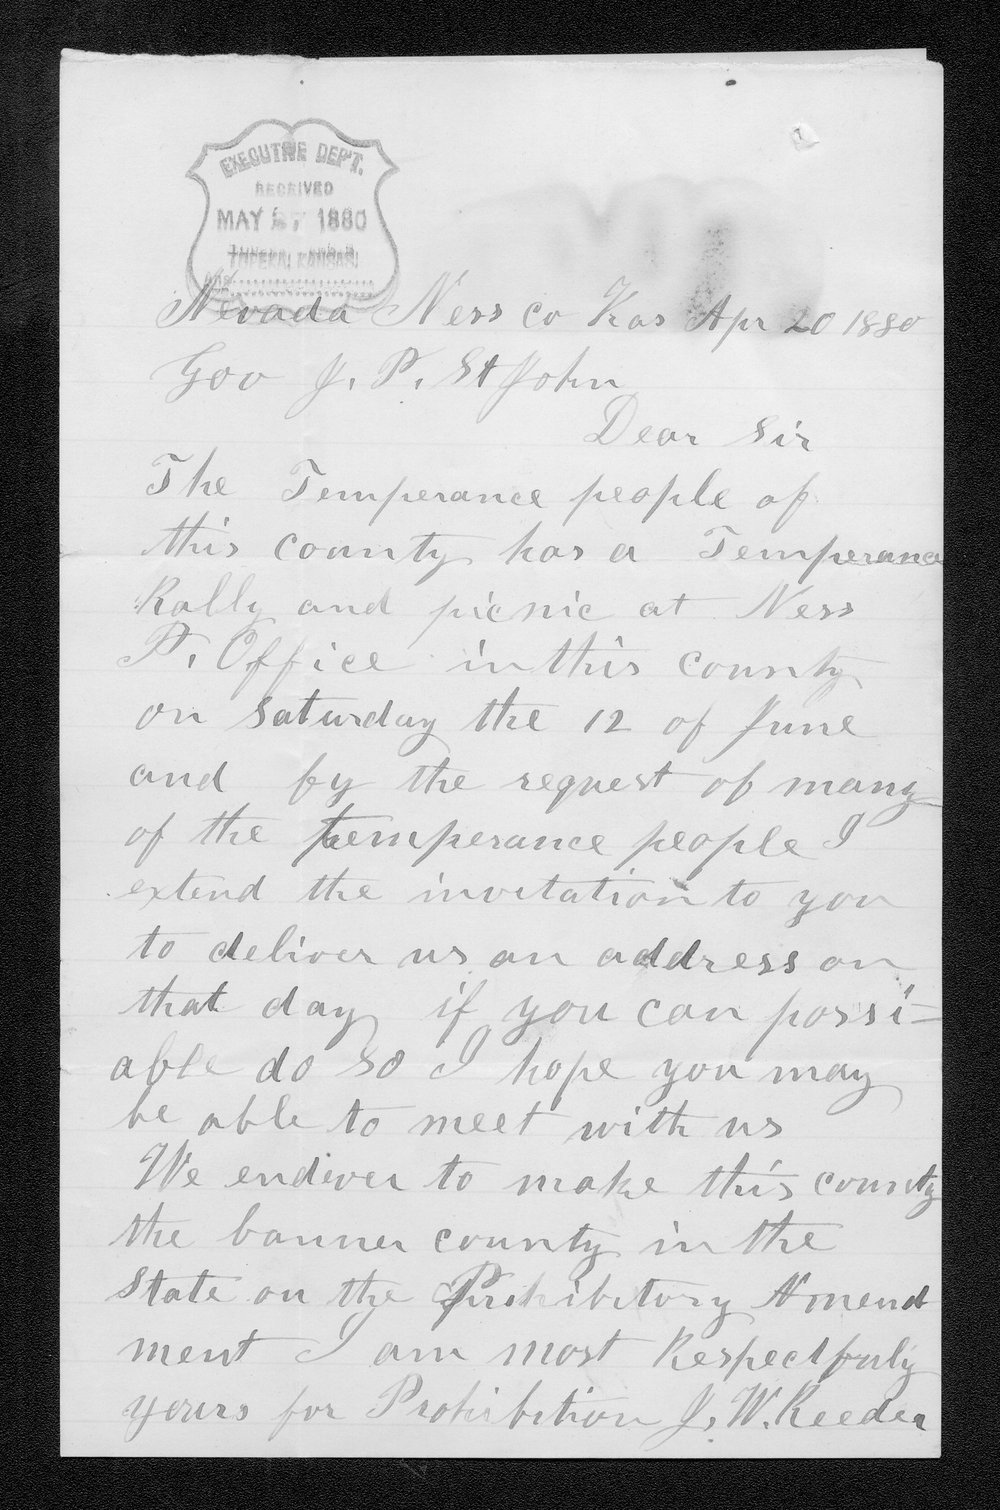 J. W. Reeder to Governor John St. John